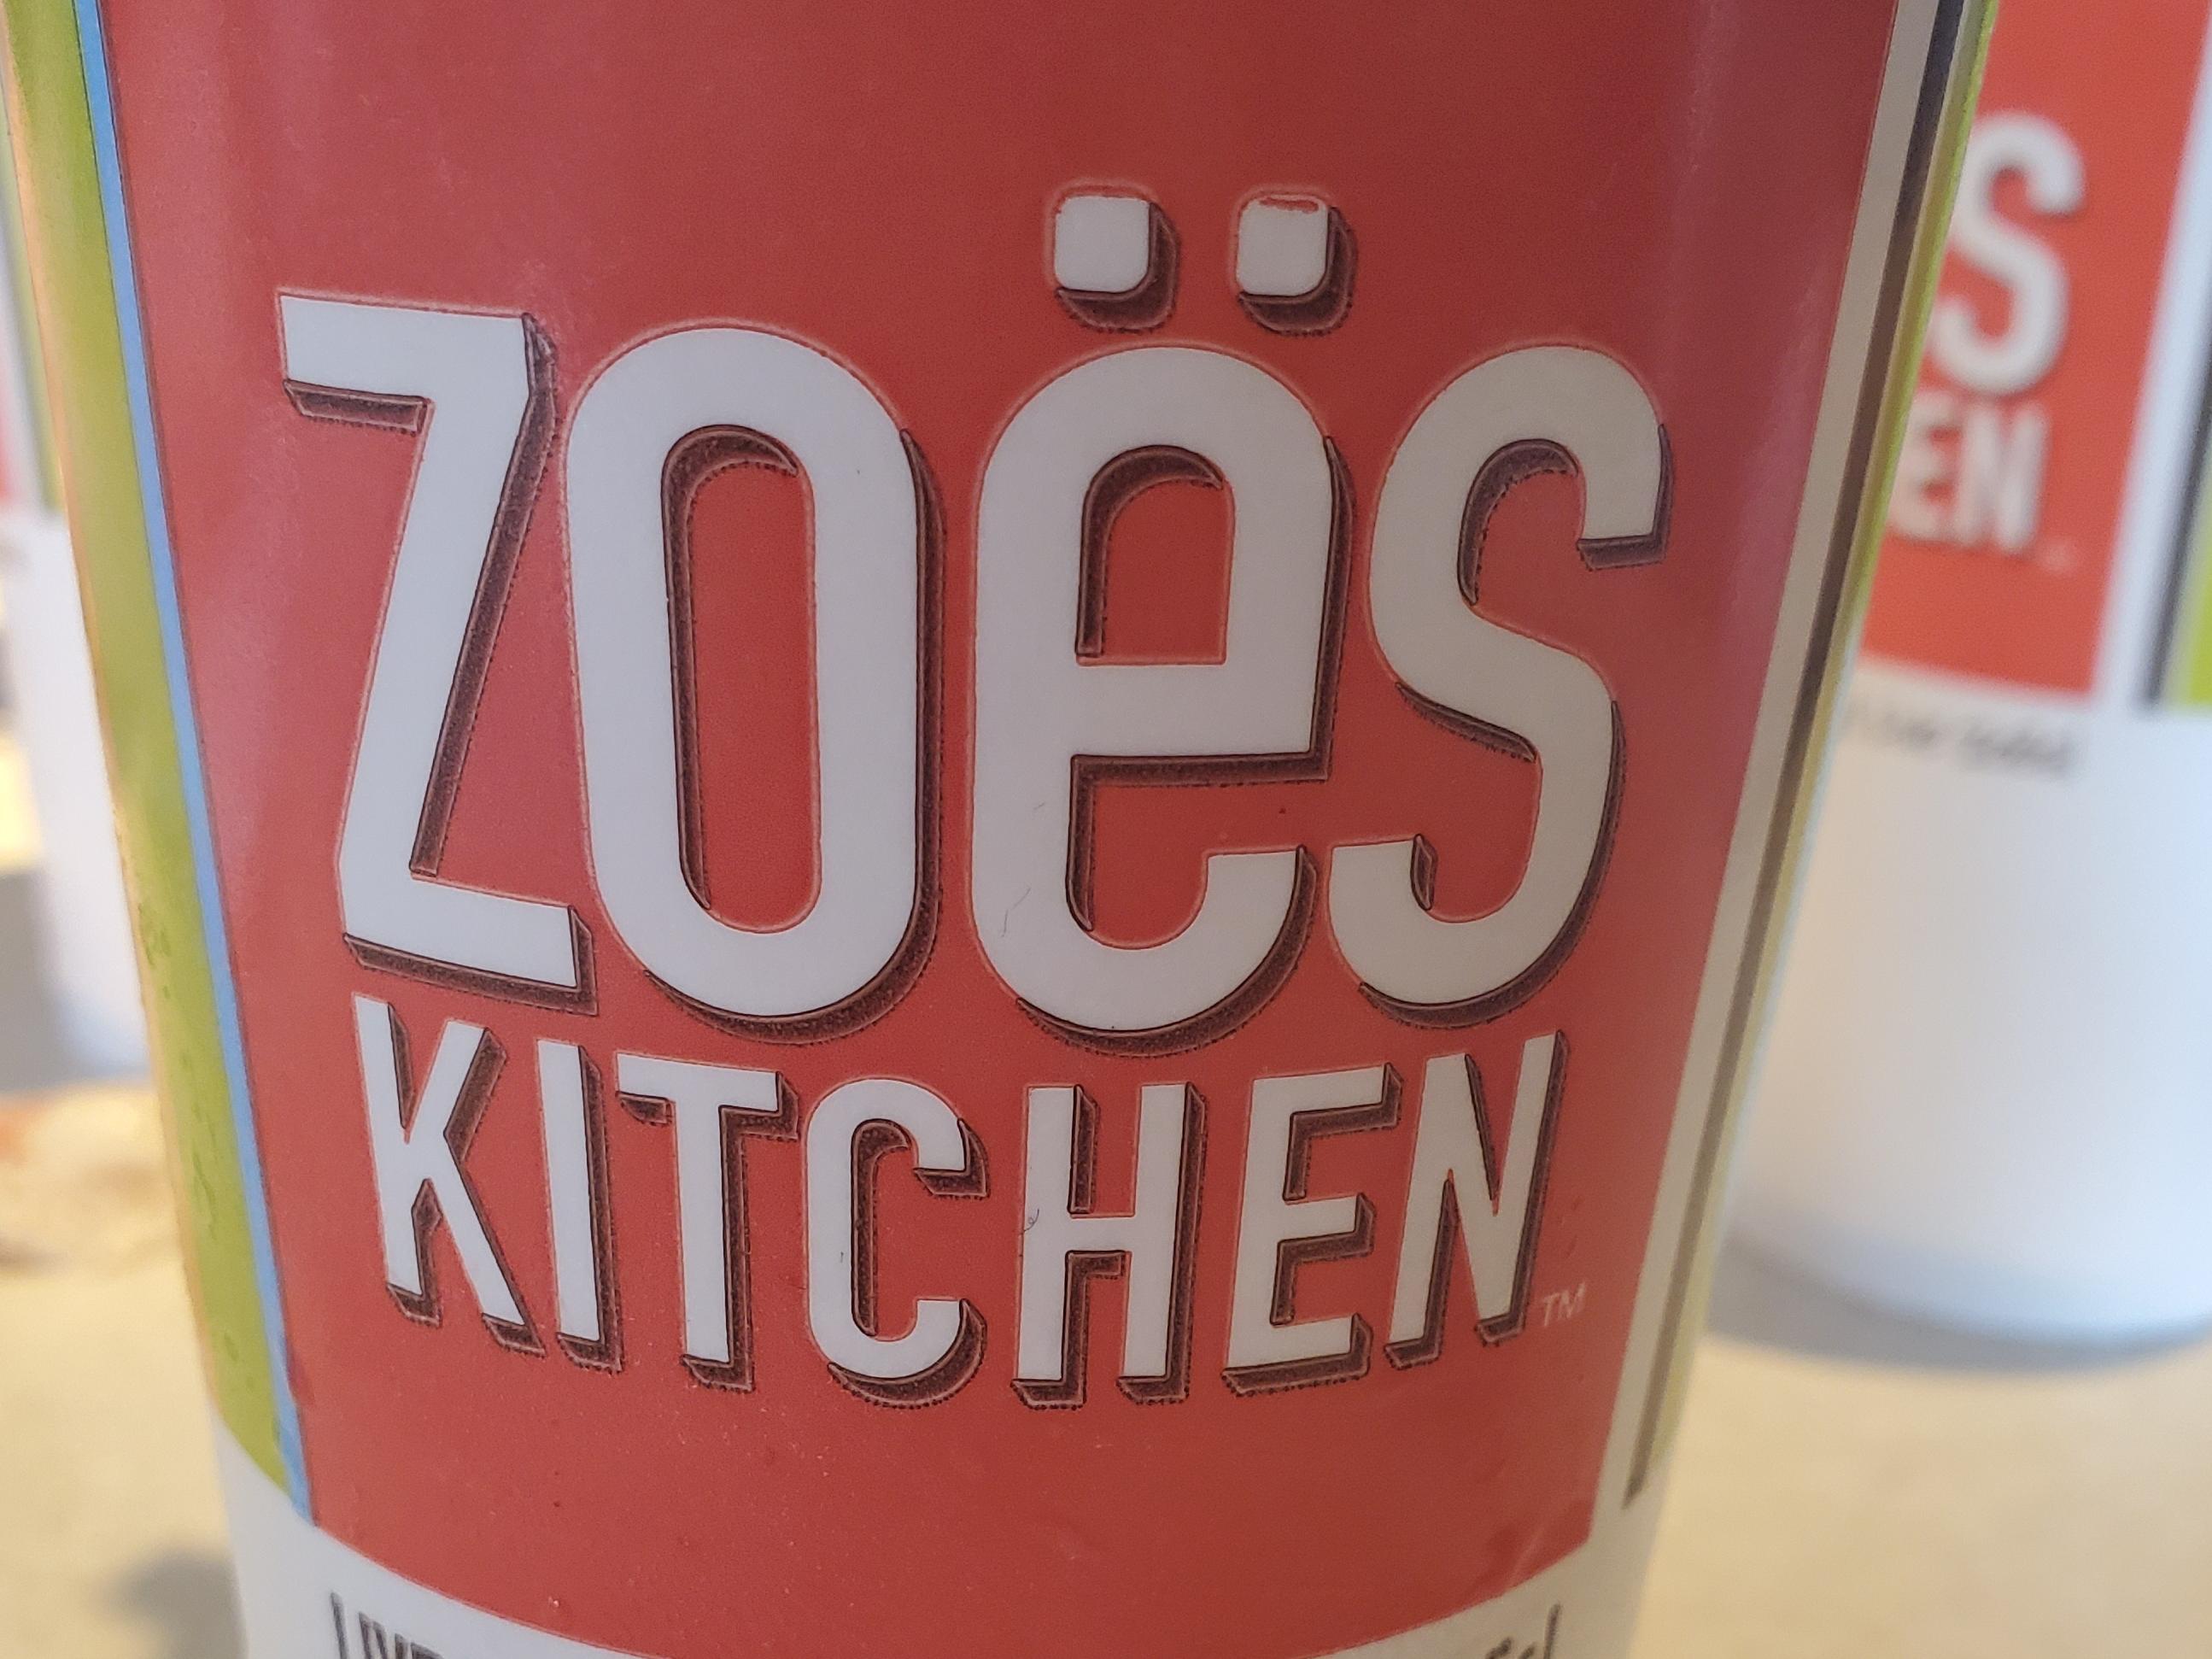 Haveing lunch at Zoës Kitchen